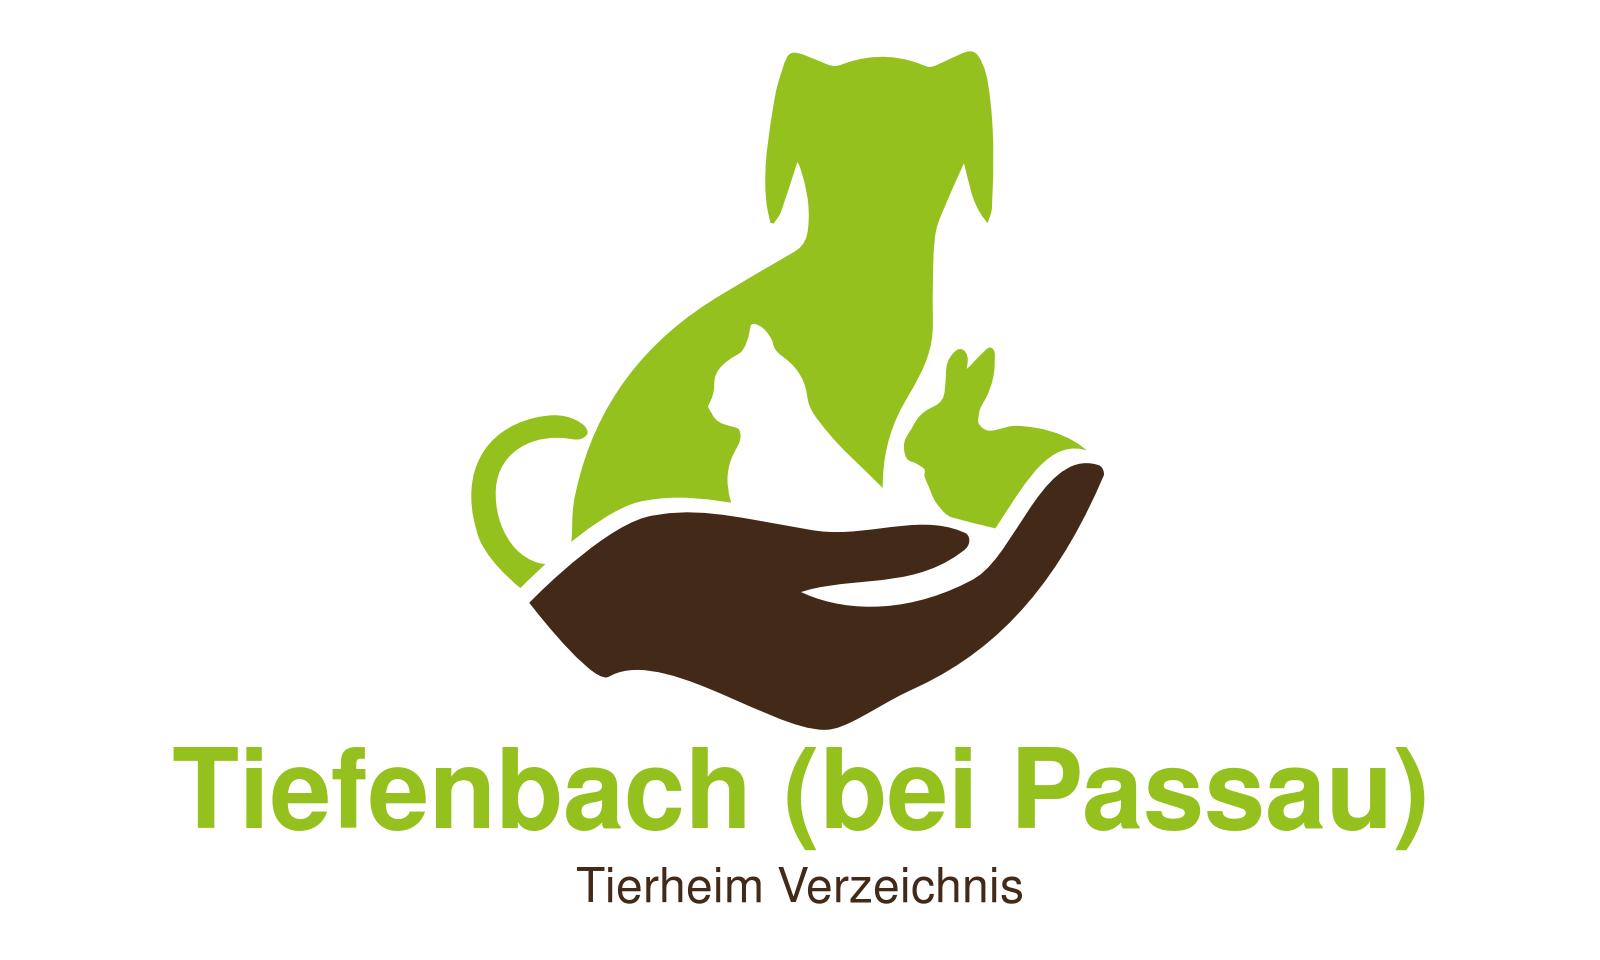 Tierheim Tiefenbach (bei Passau)